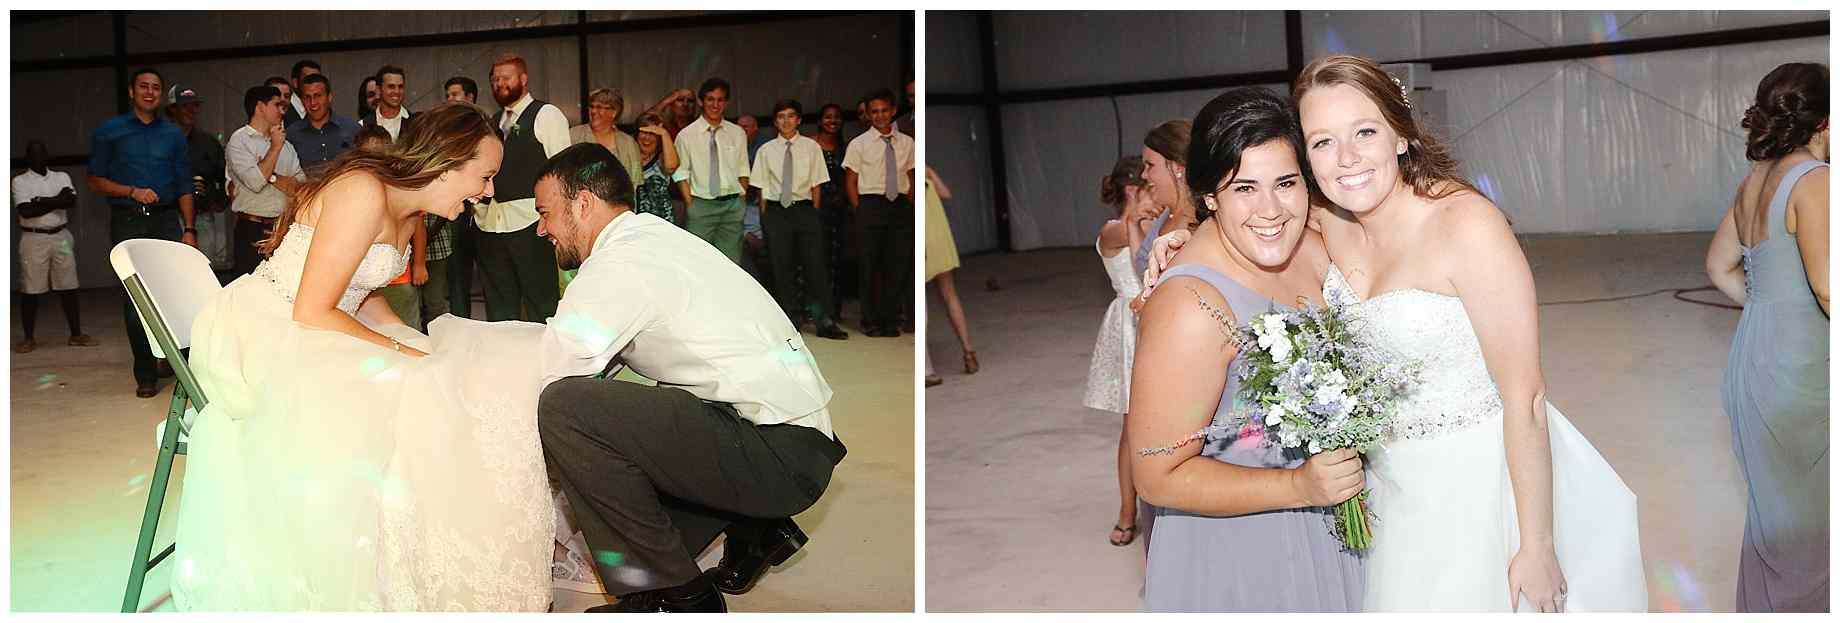 flying-t-ranch-wedding-photos-042